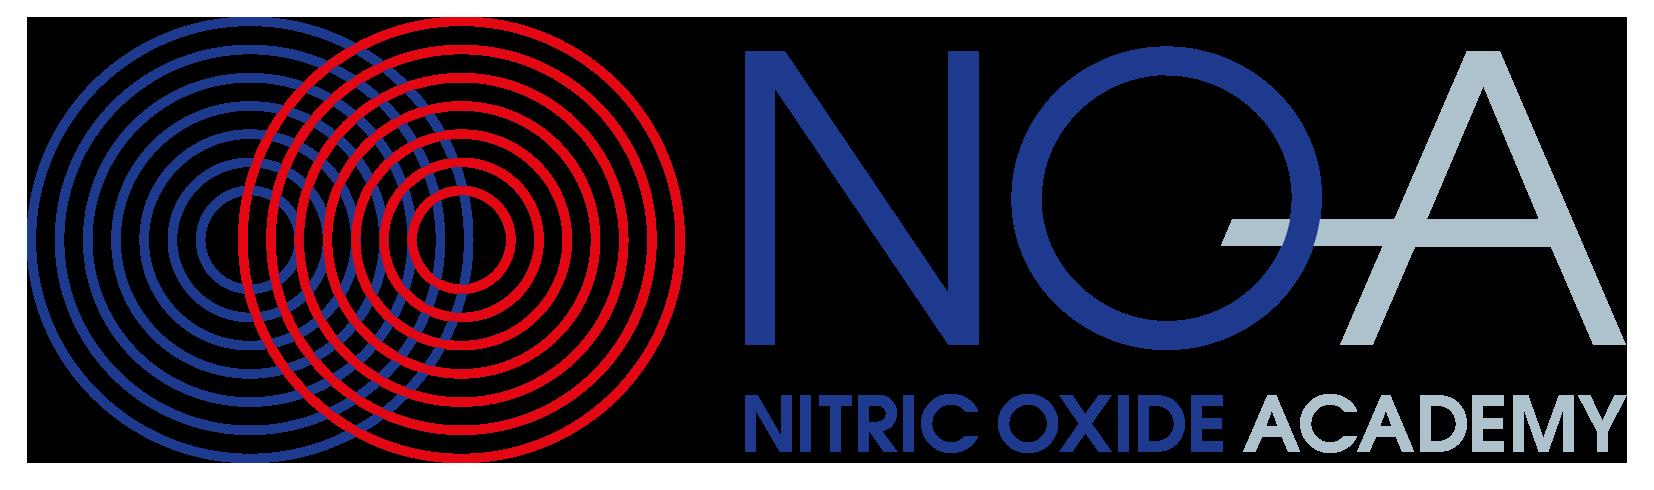 NOA-logo-2.png